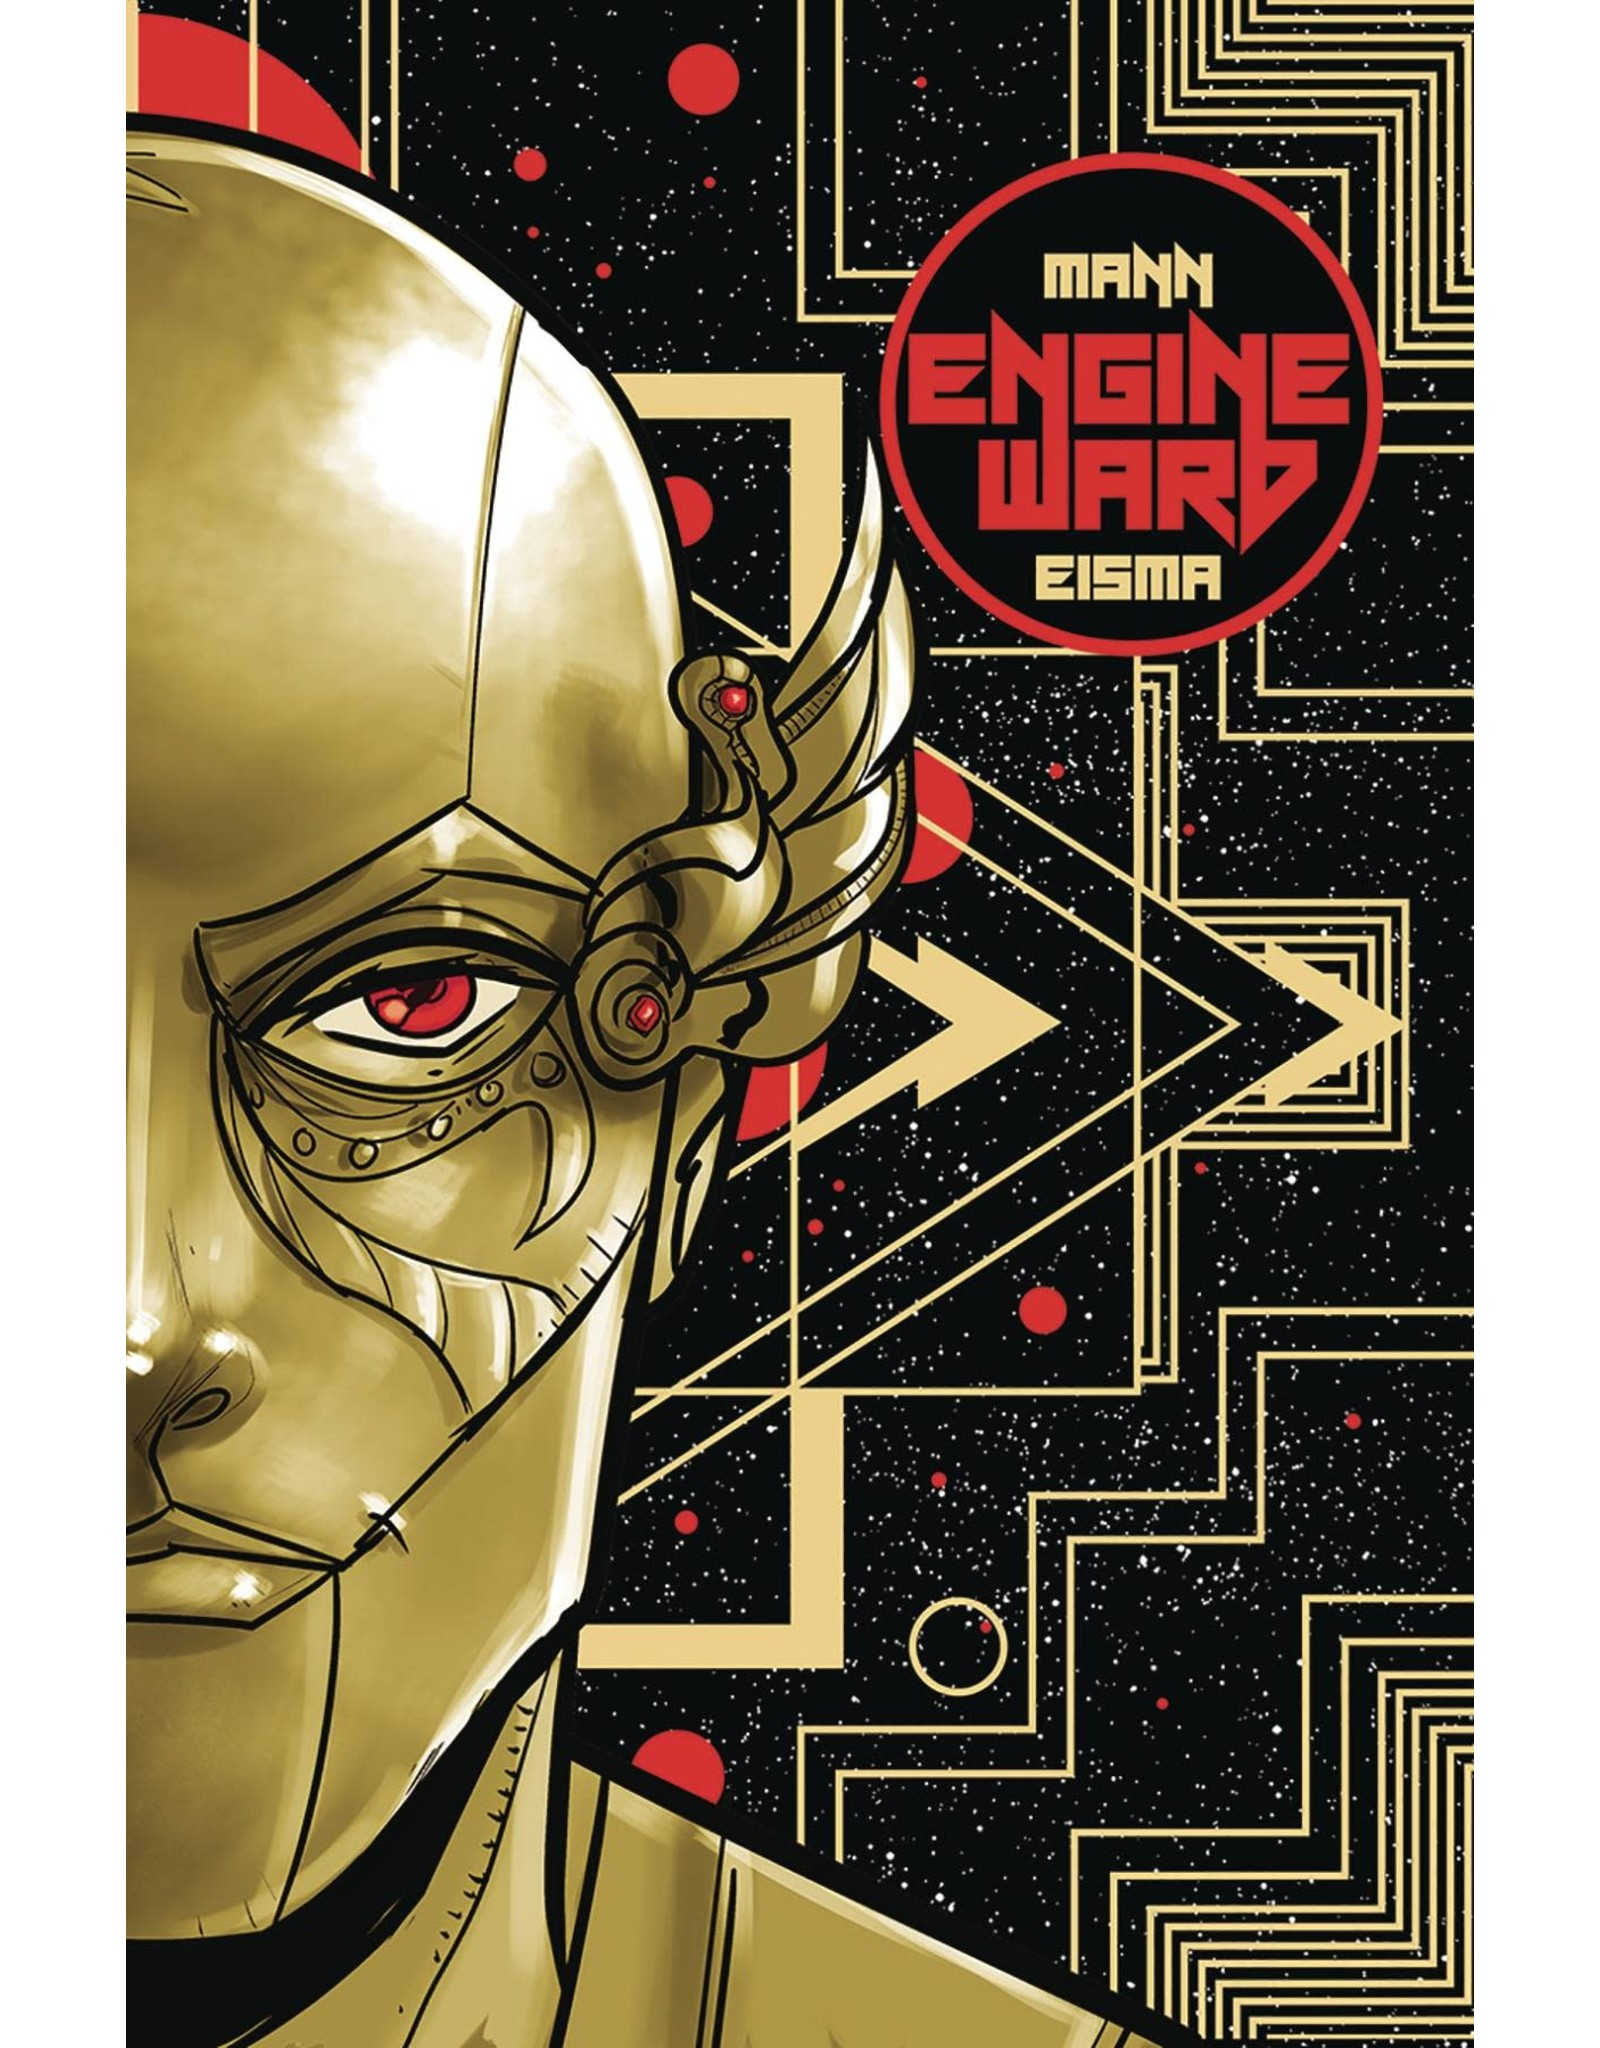 VAULT COMICS ENGINEWARD #1 CVR A EISMA